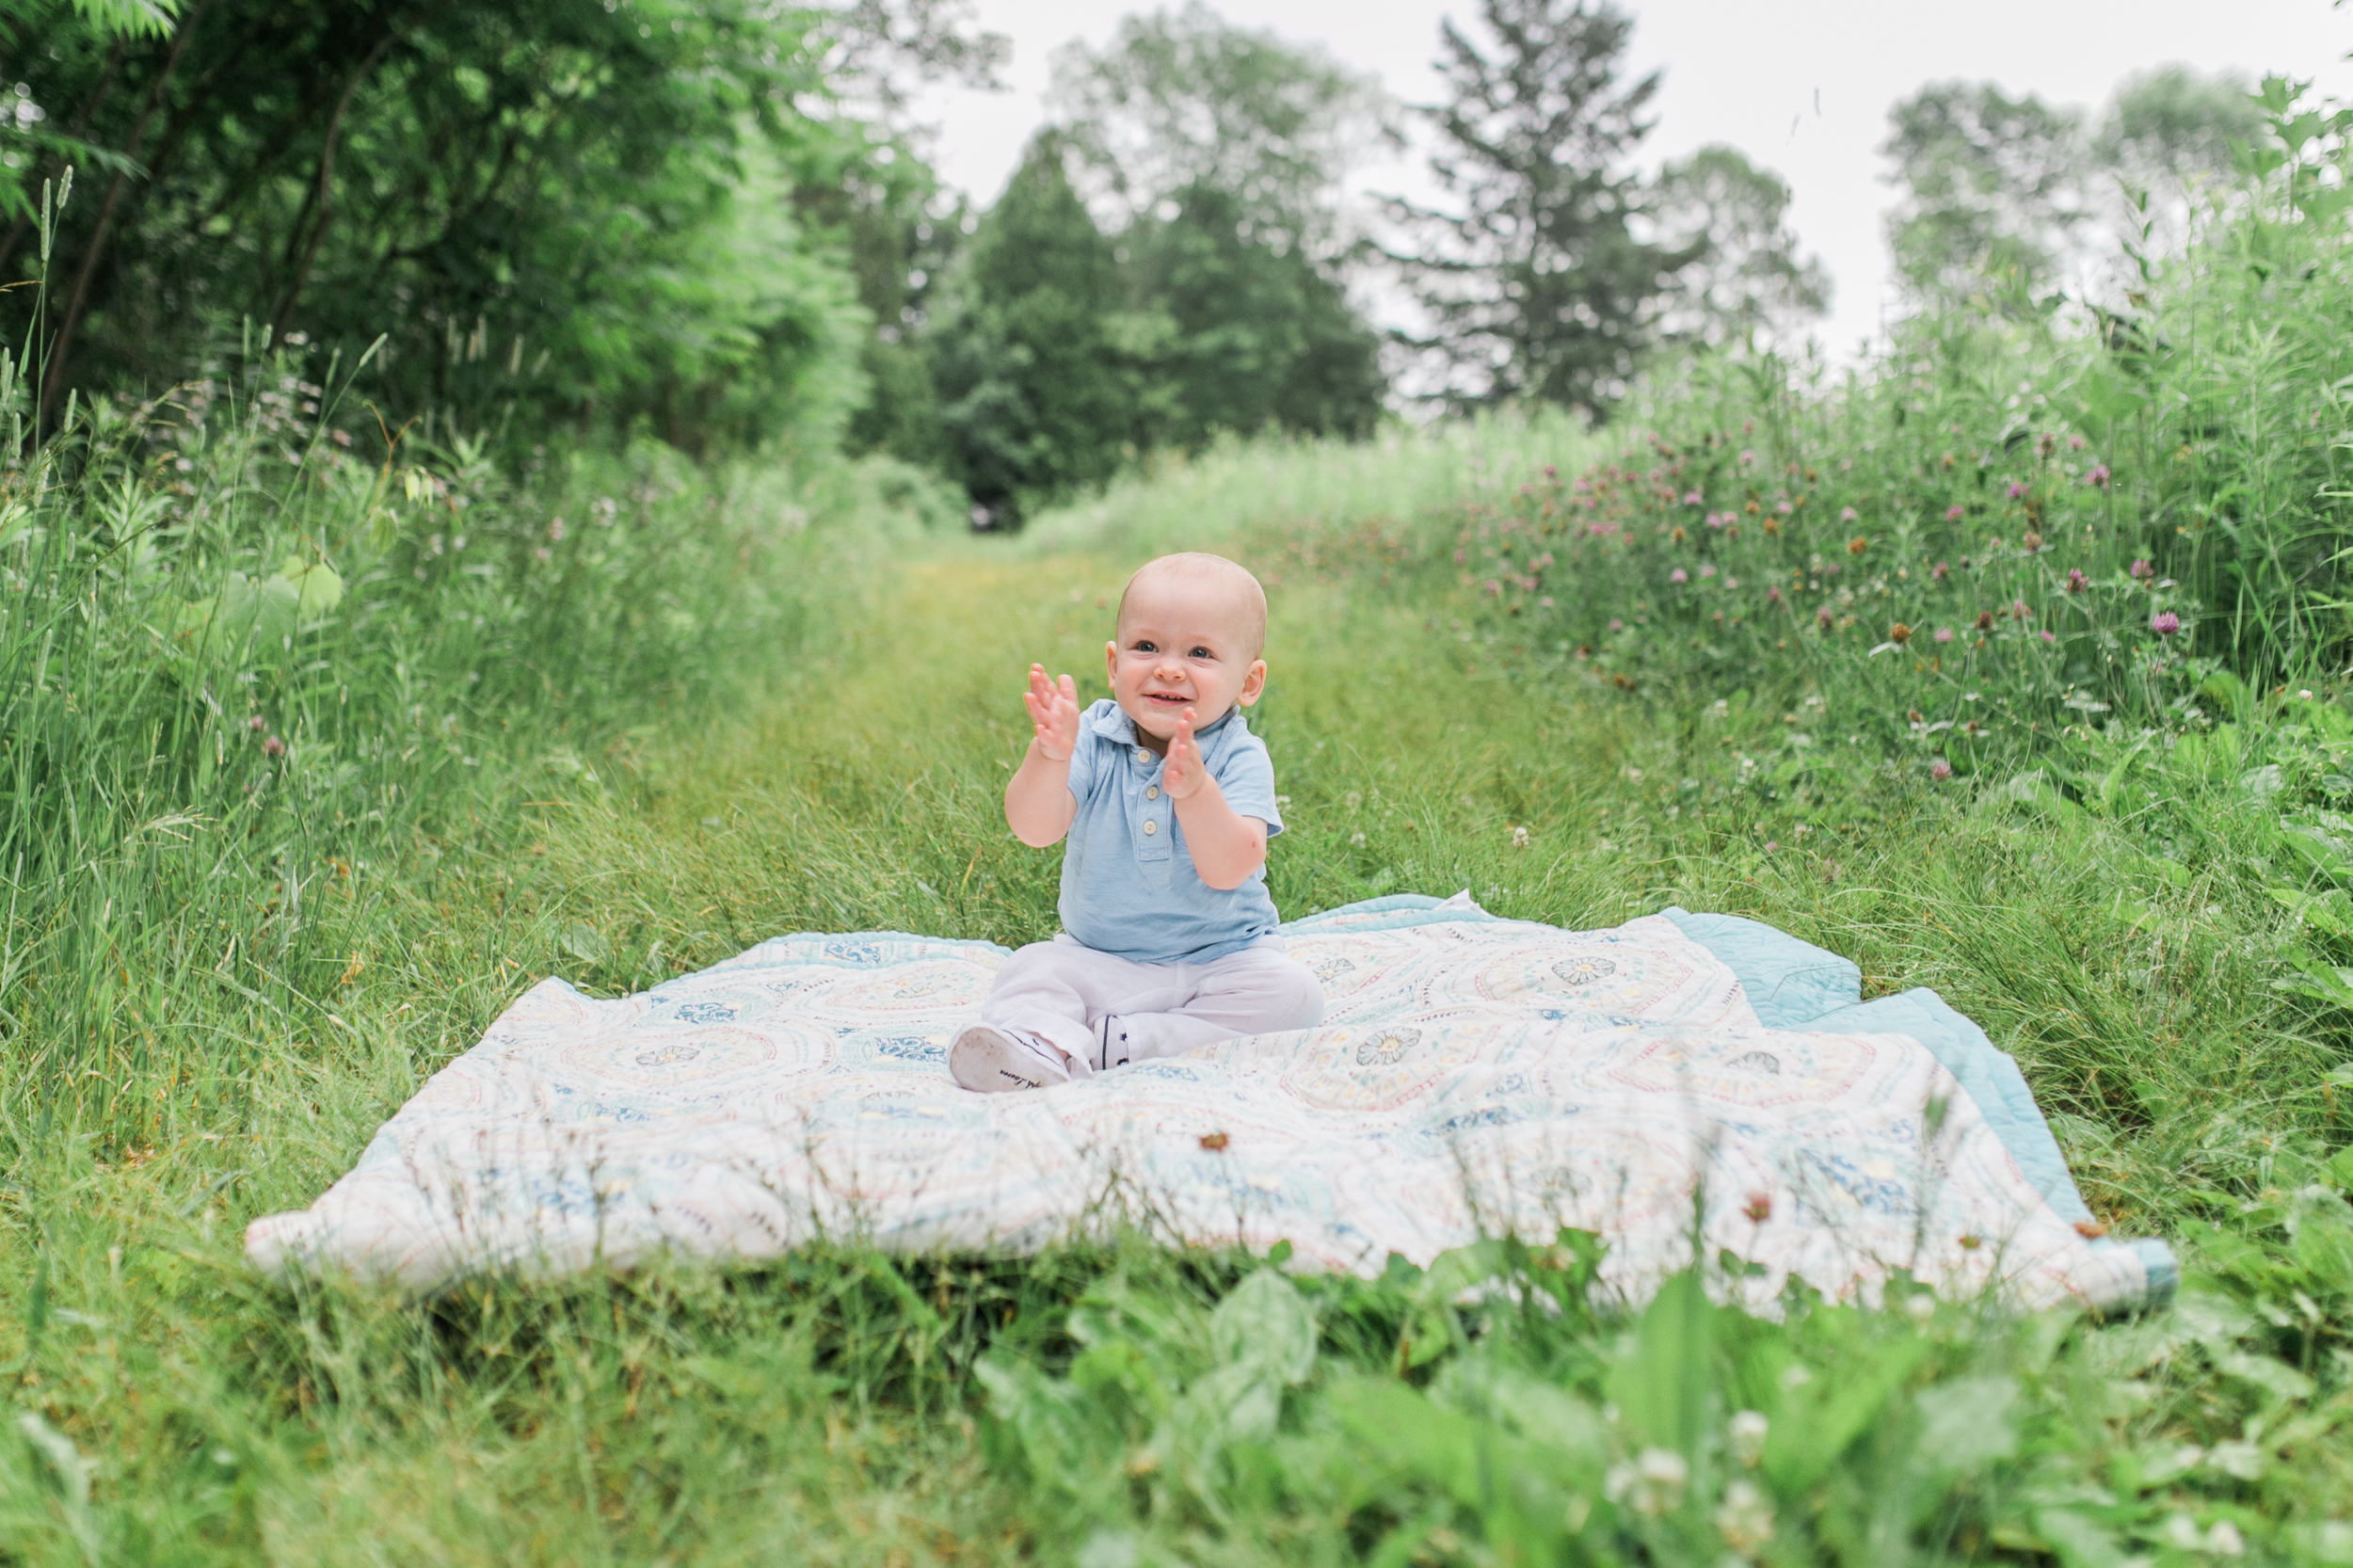 vanessa wyler pewaukee photographer one year old photos